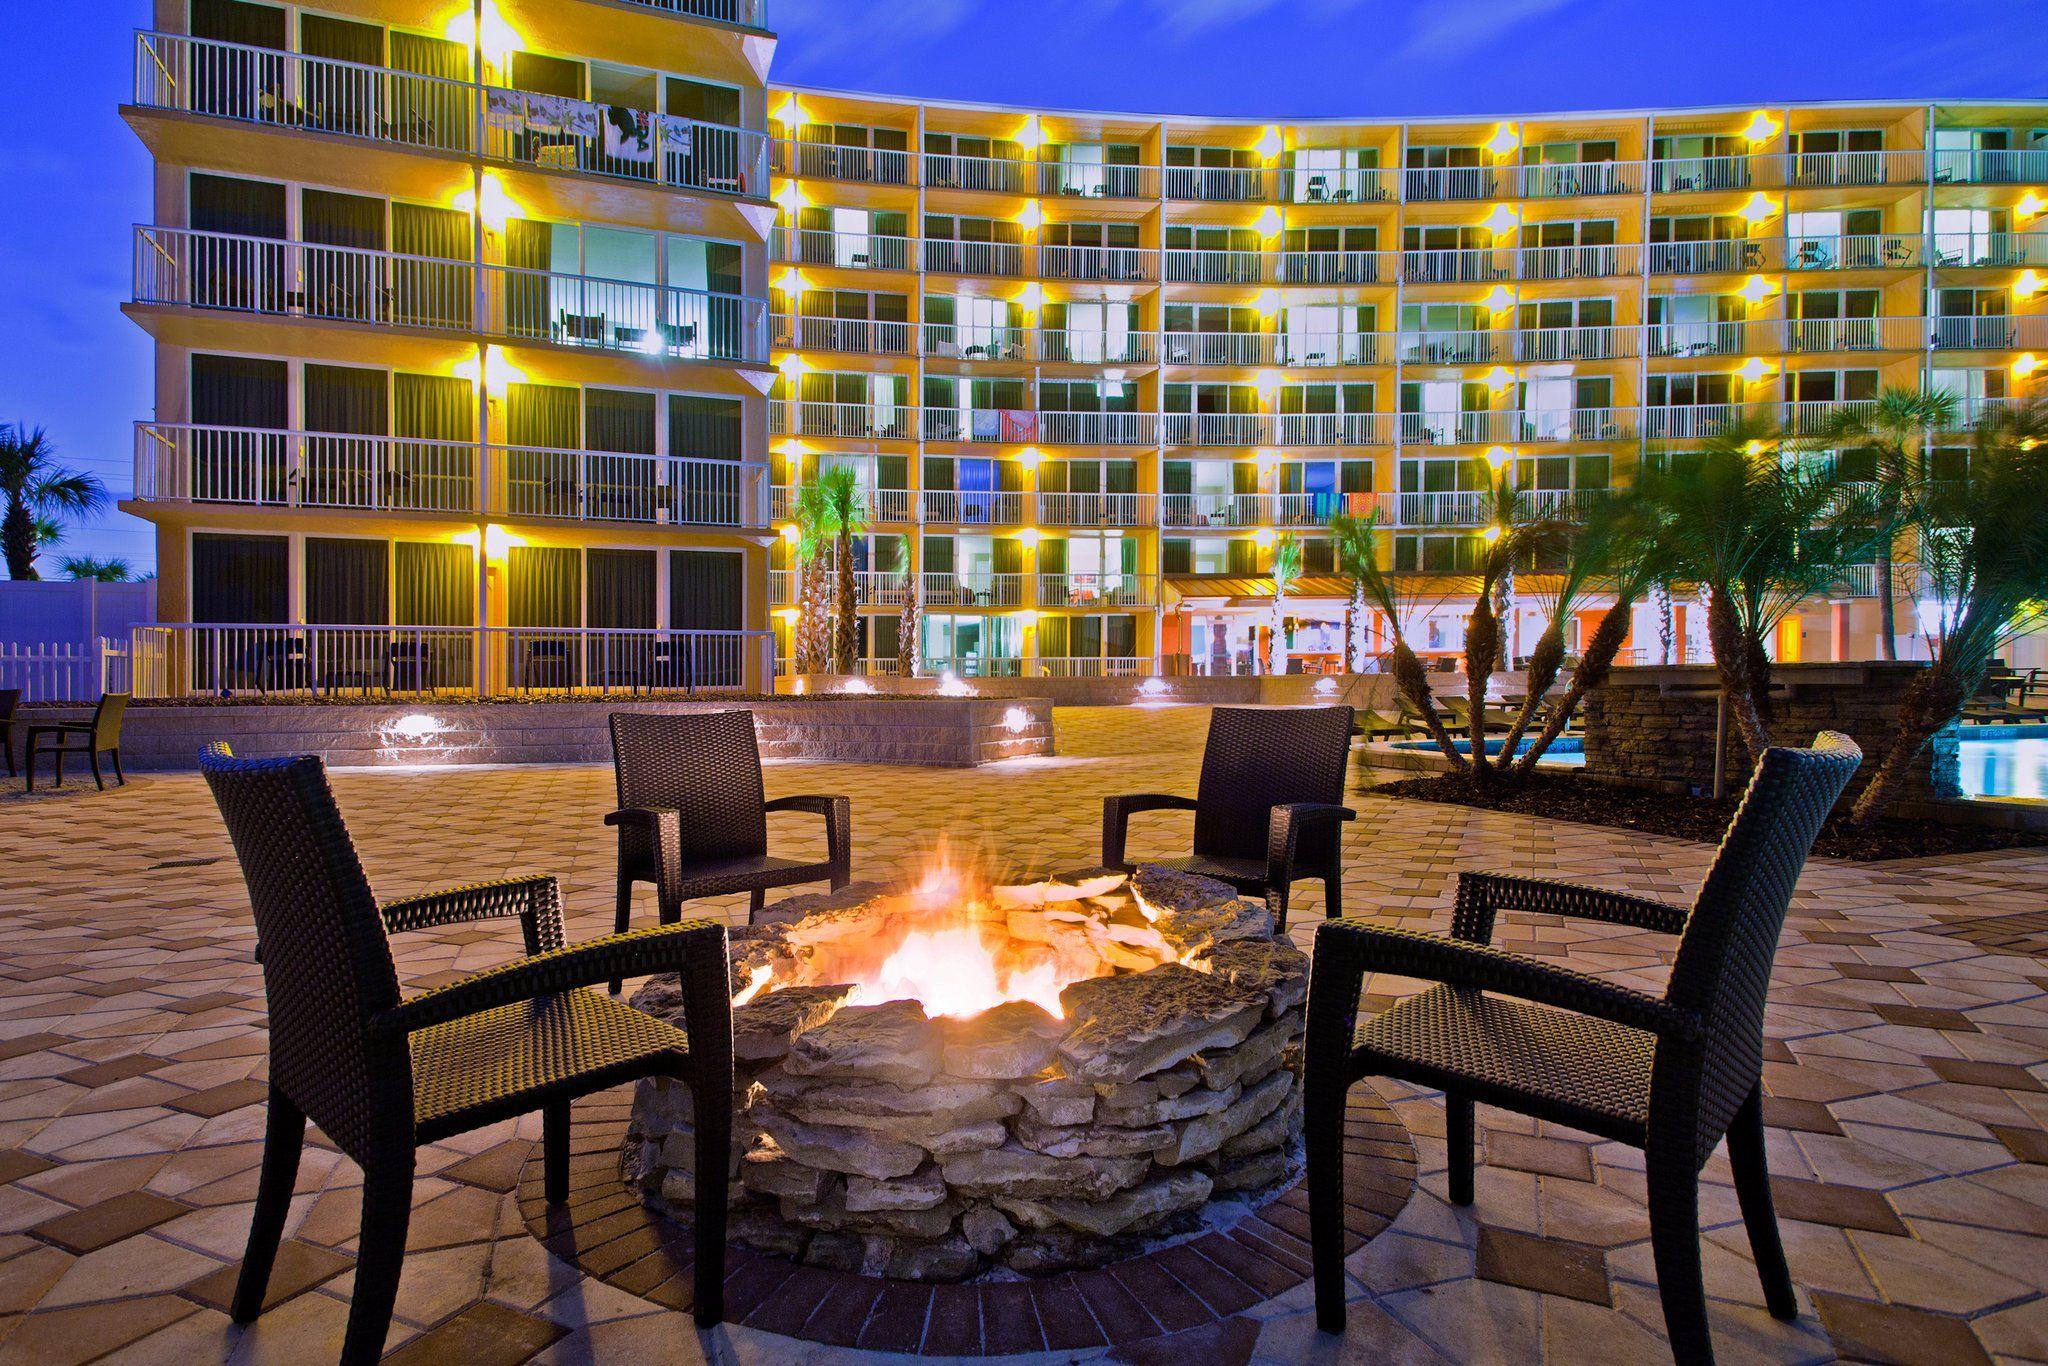 Relax, enjoy, unwind and rejuvenate in Daytona Beach, Folrida!